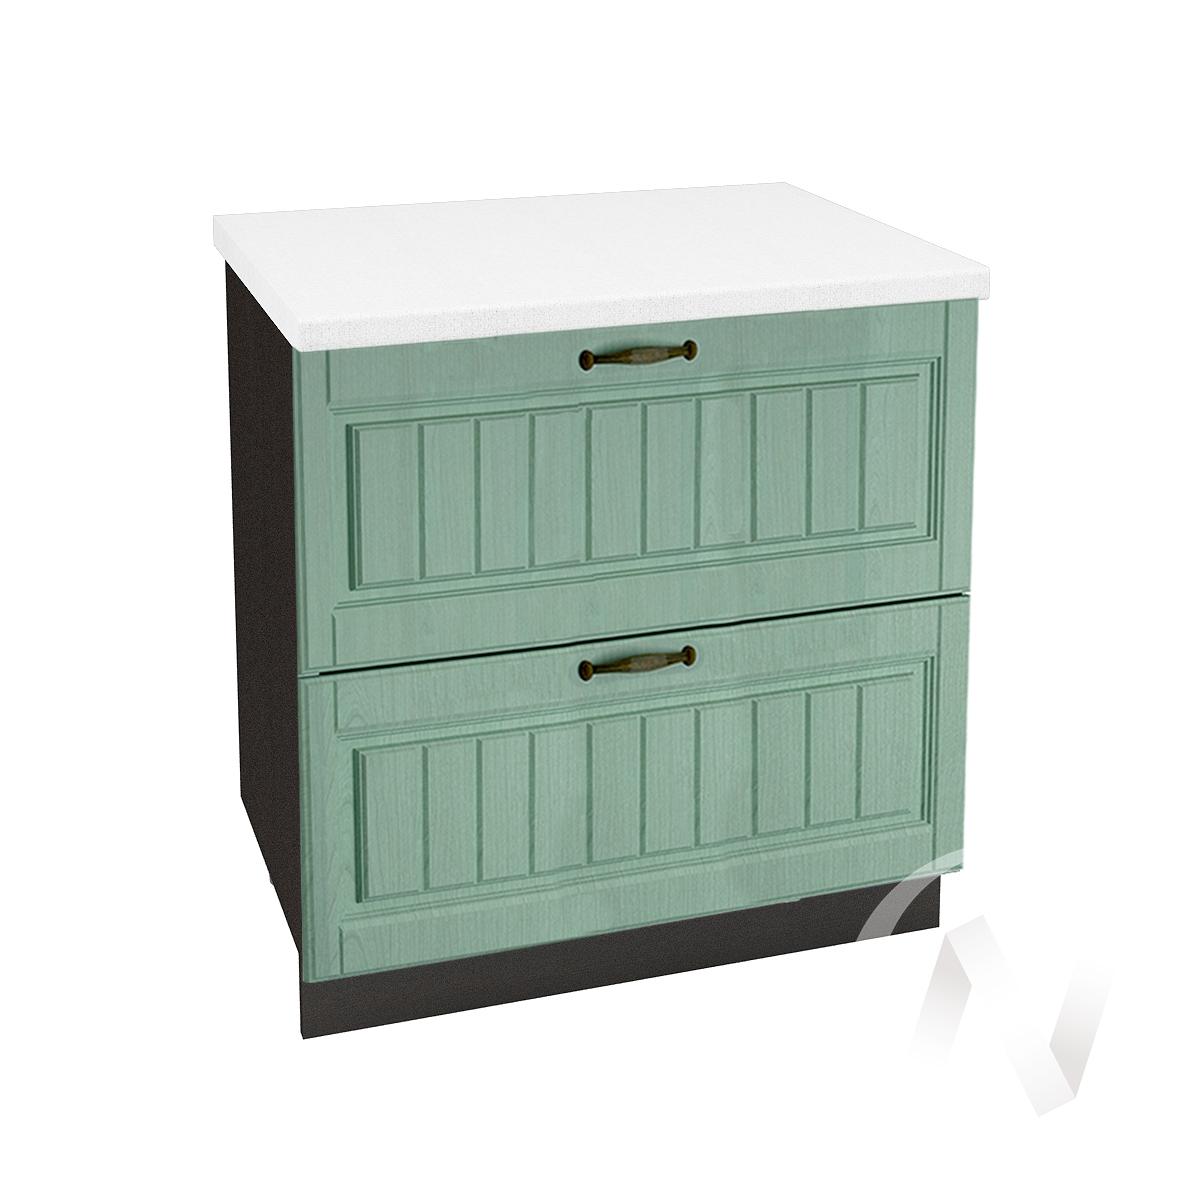 "Кухня ""Прованс"": Шкаф нижний с 2-мя ящиками 800, ШН2Я 800 (корпус венге)"